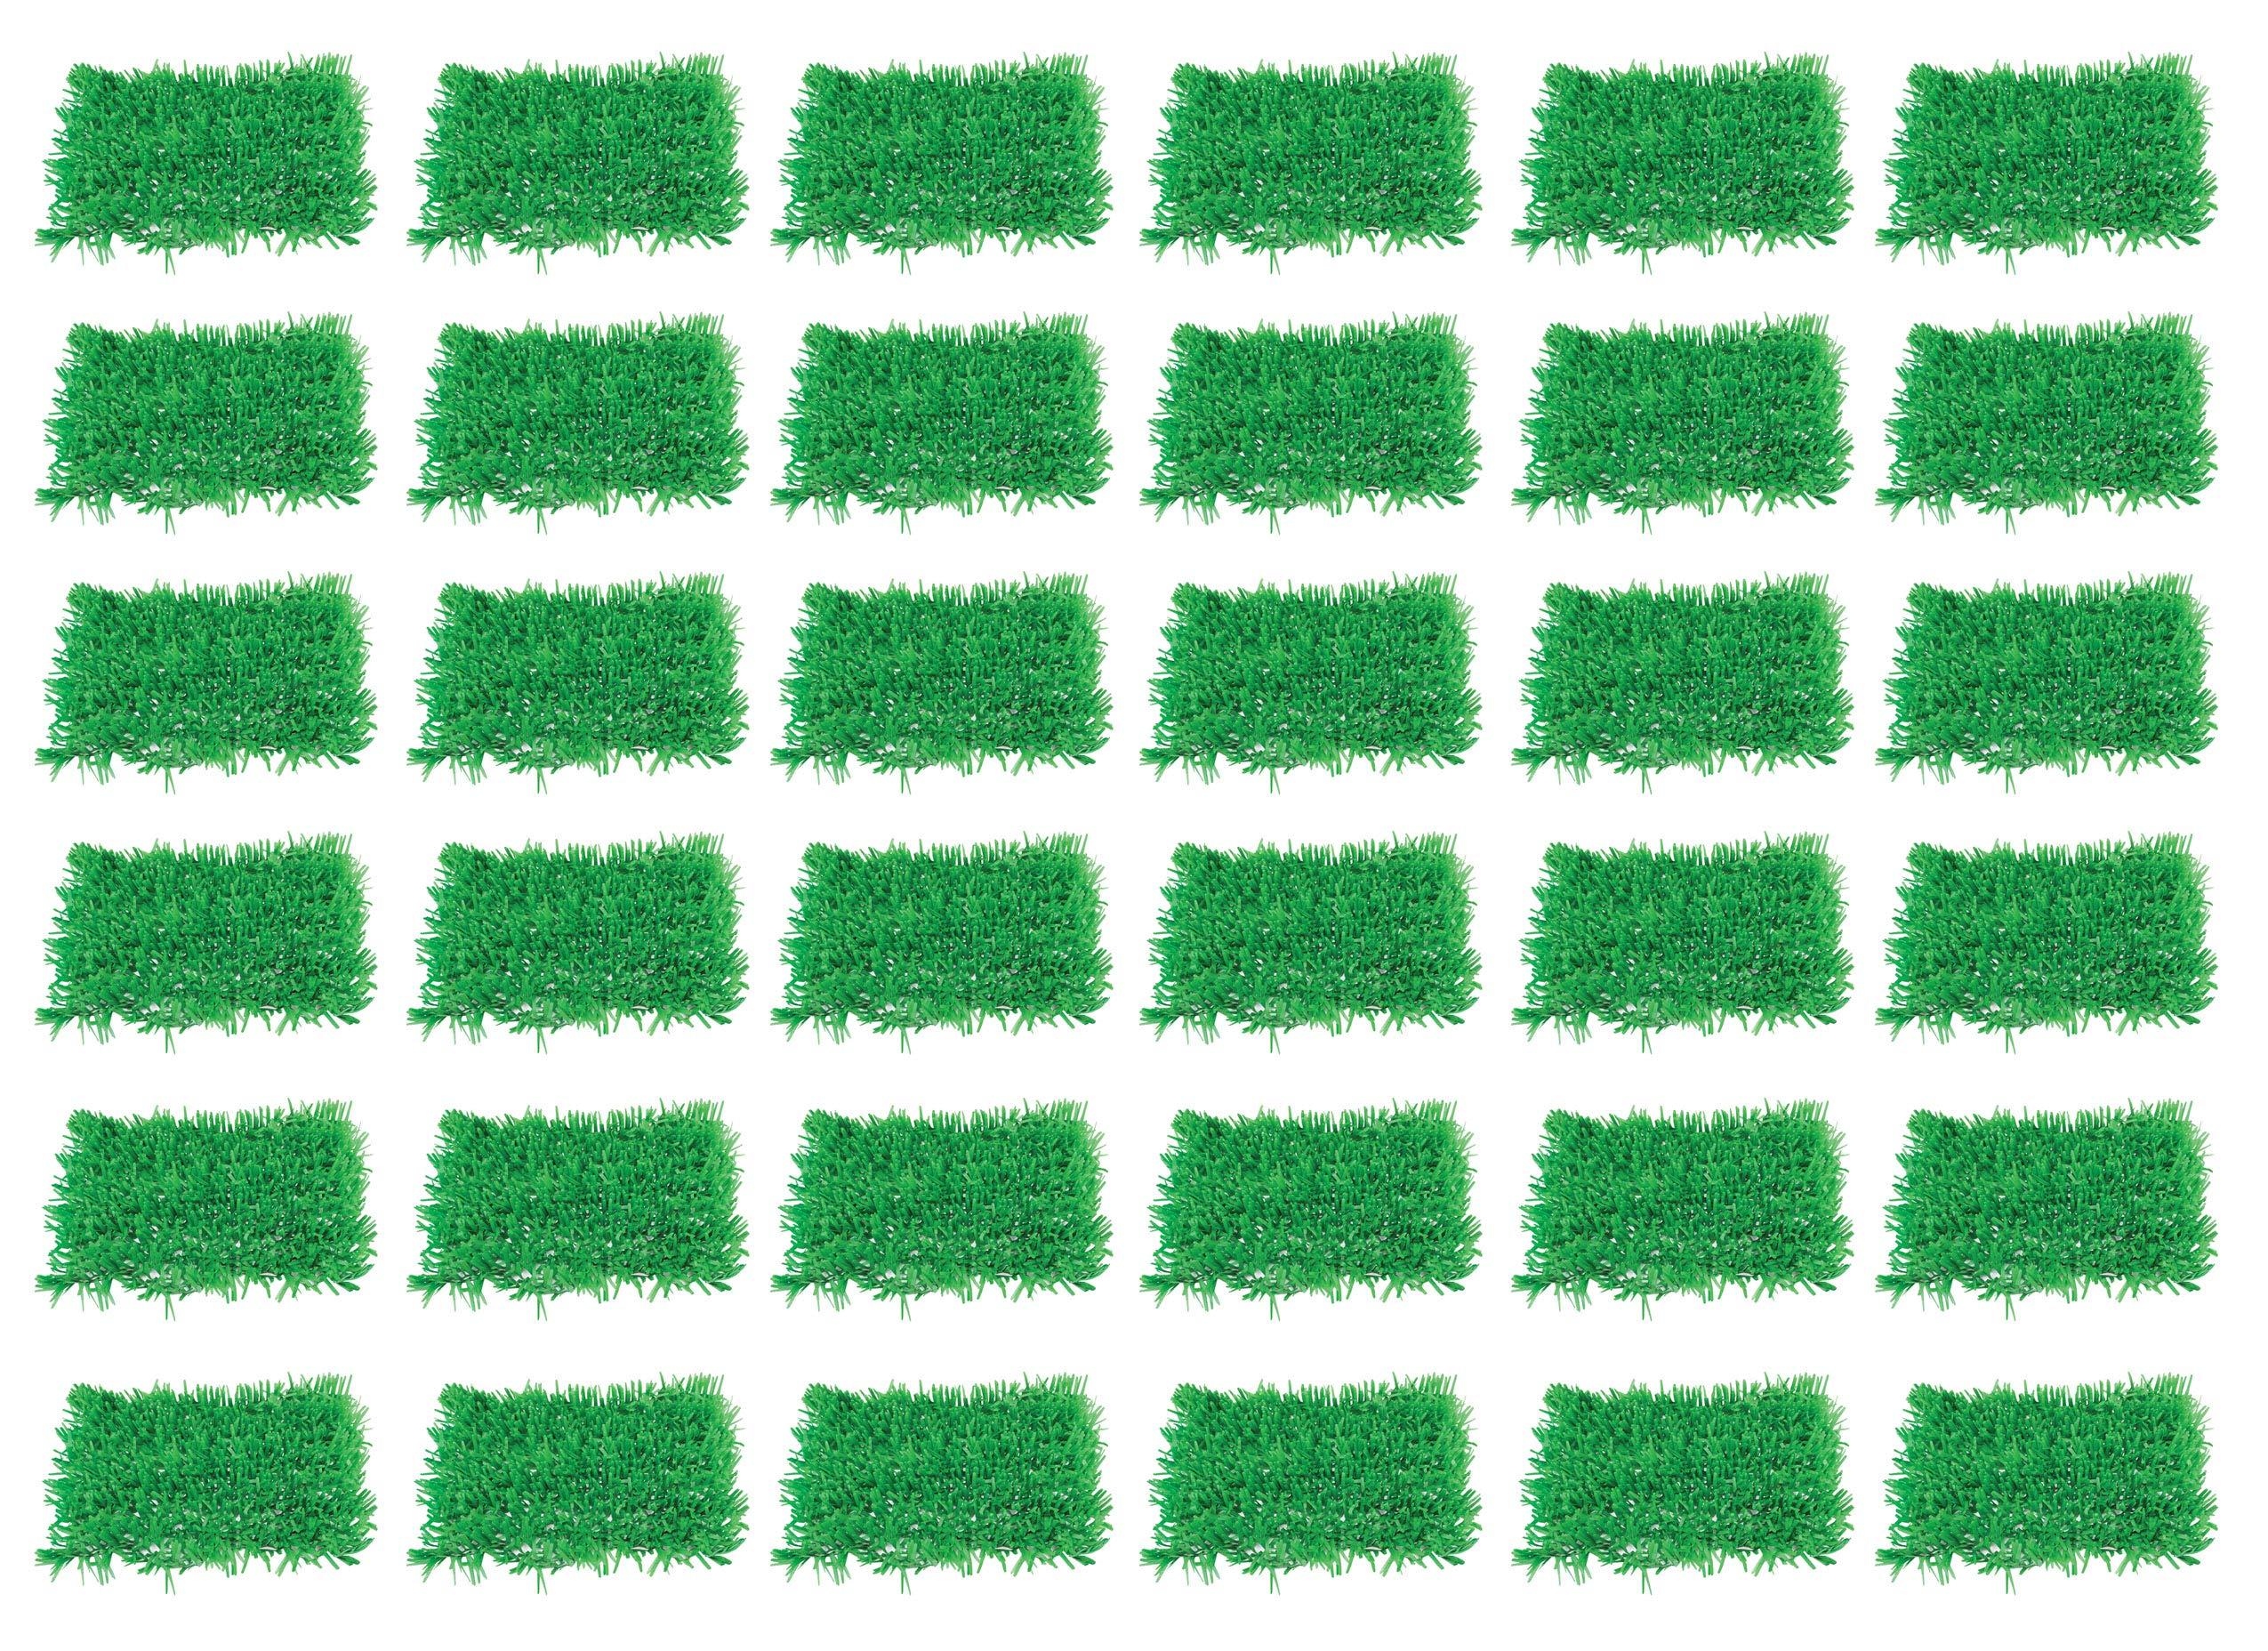 Beistle 55640 36-Pack Tissue Grass Mat, 15-Inch by 30-Inch